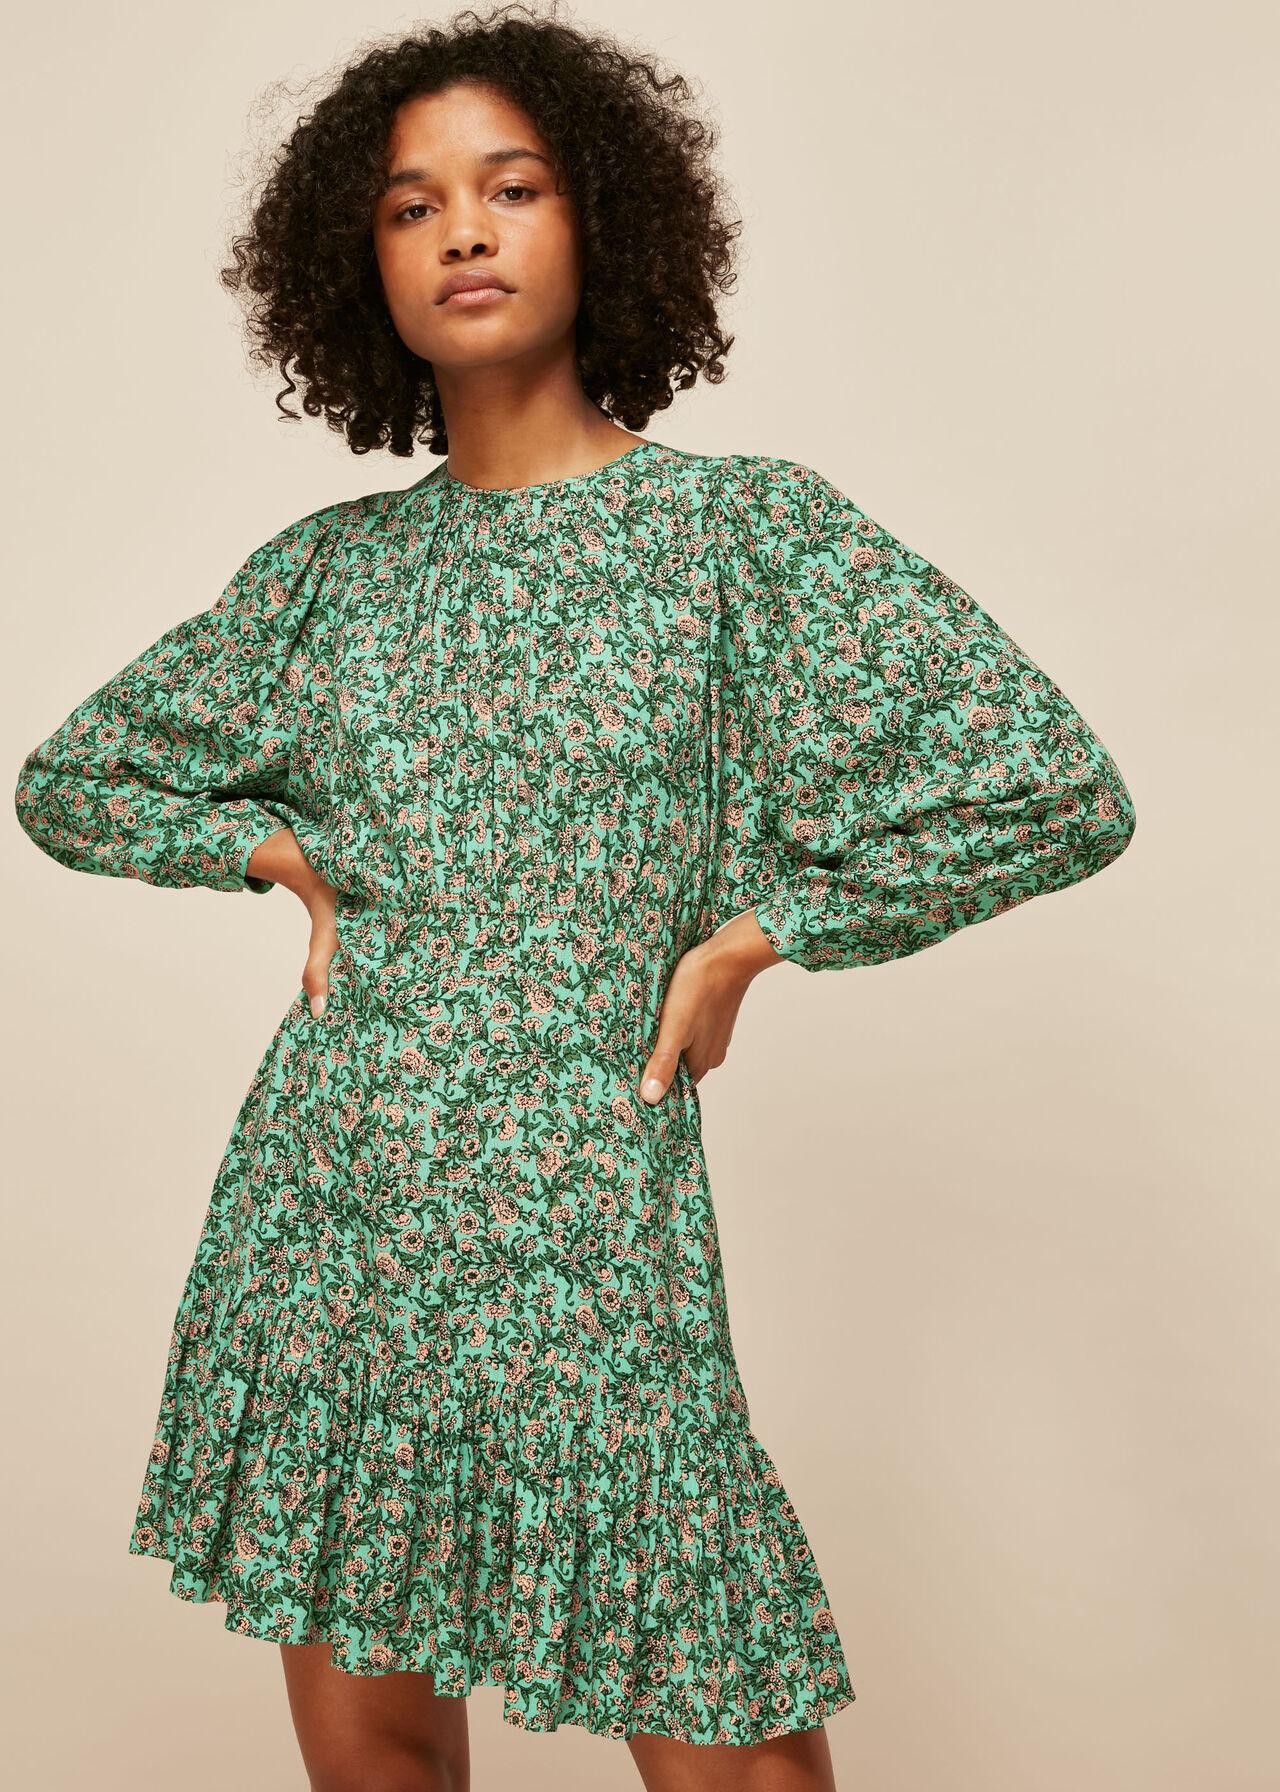 Heath Floral Print Dress